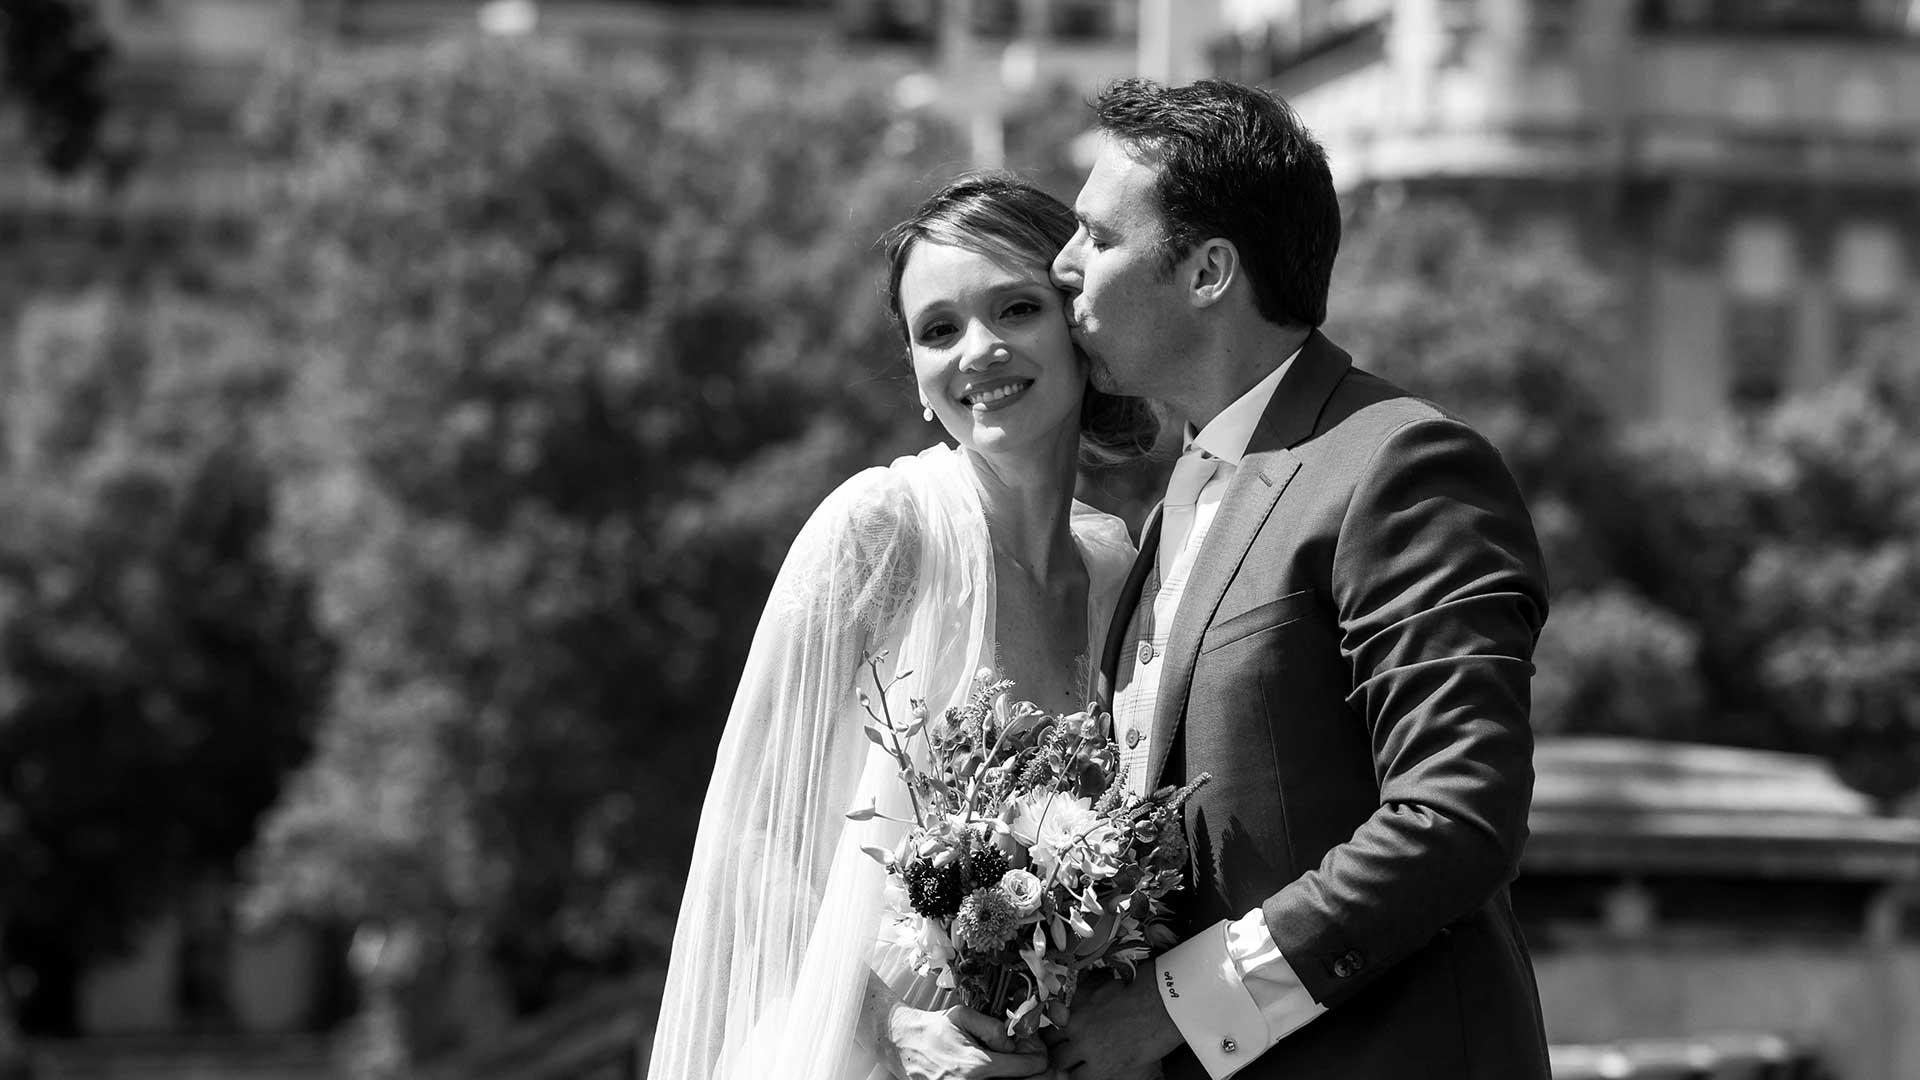 photographe-mariage-paris-22-NB